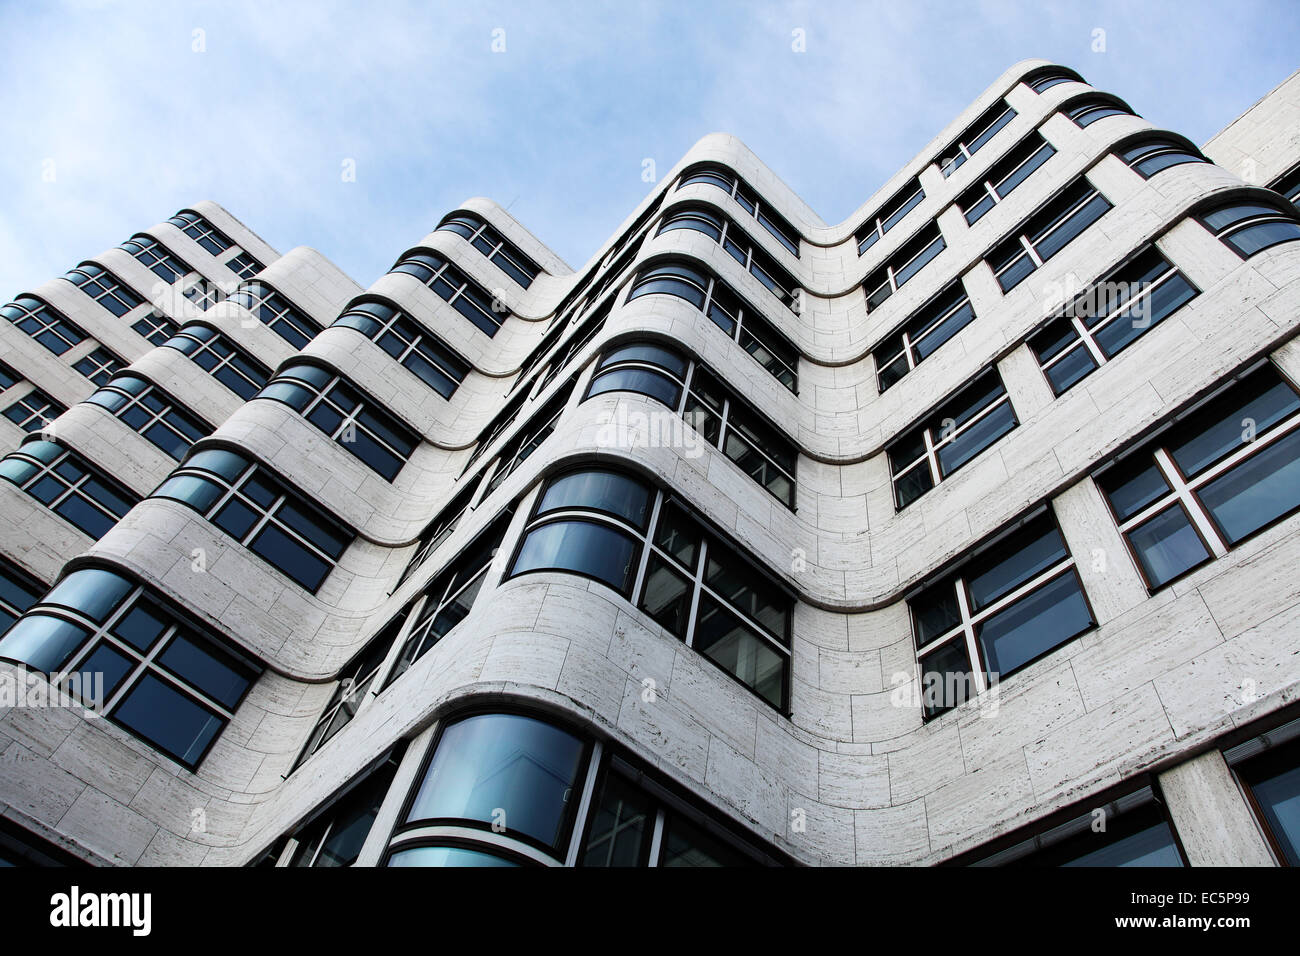 Bauhaus Architektur In Berlin Stockfoto Bild 76344613 Alamy